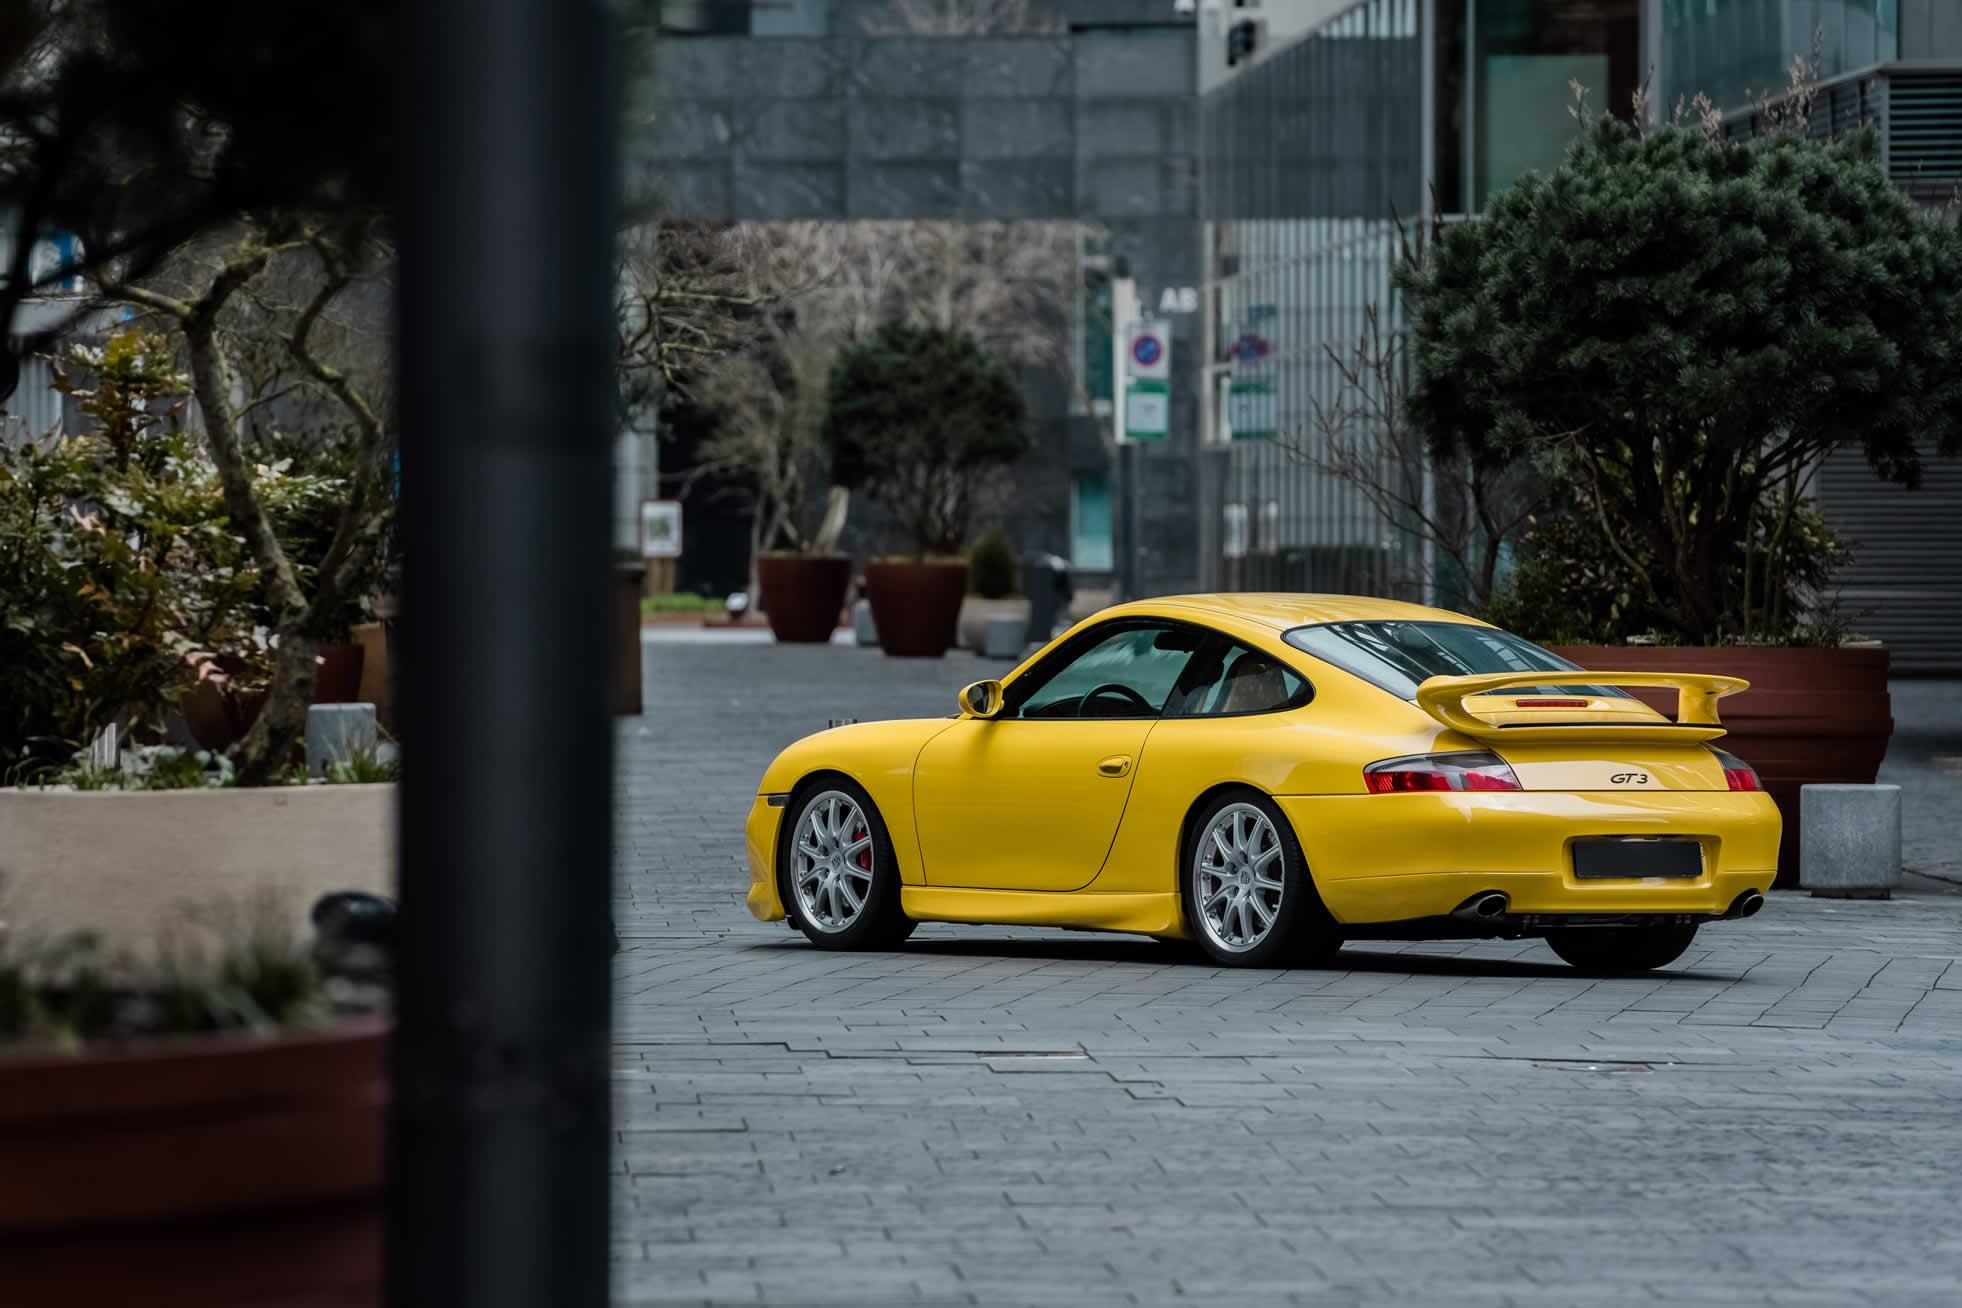 For sale, 2001 Porsche 996 GT3, Sports Purpose, Bicester